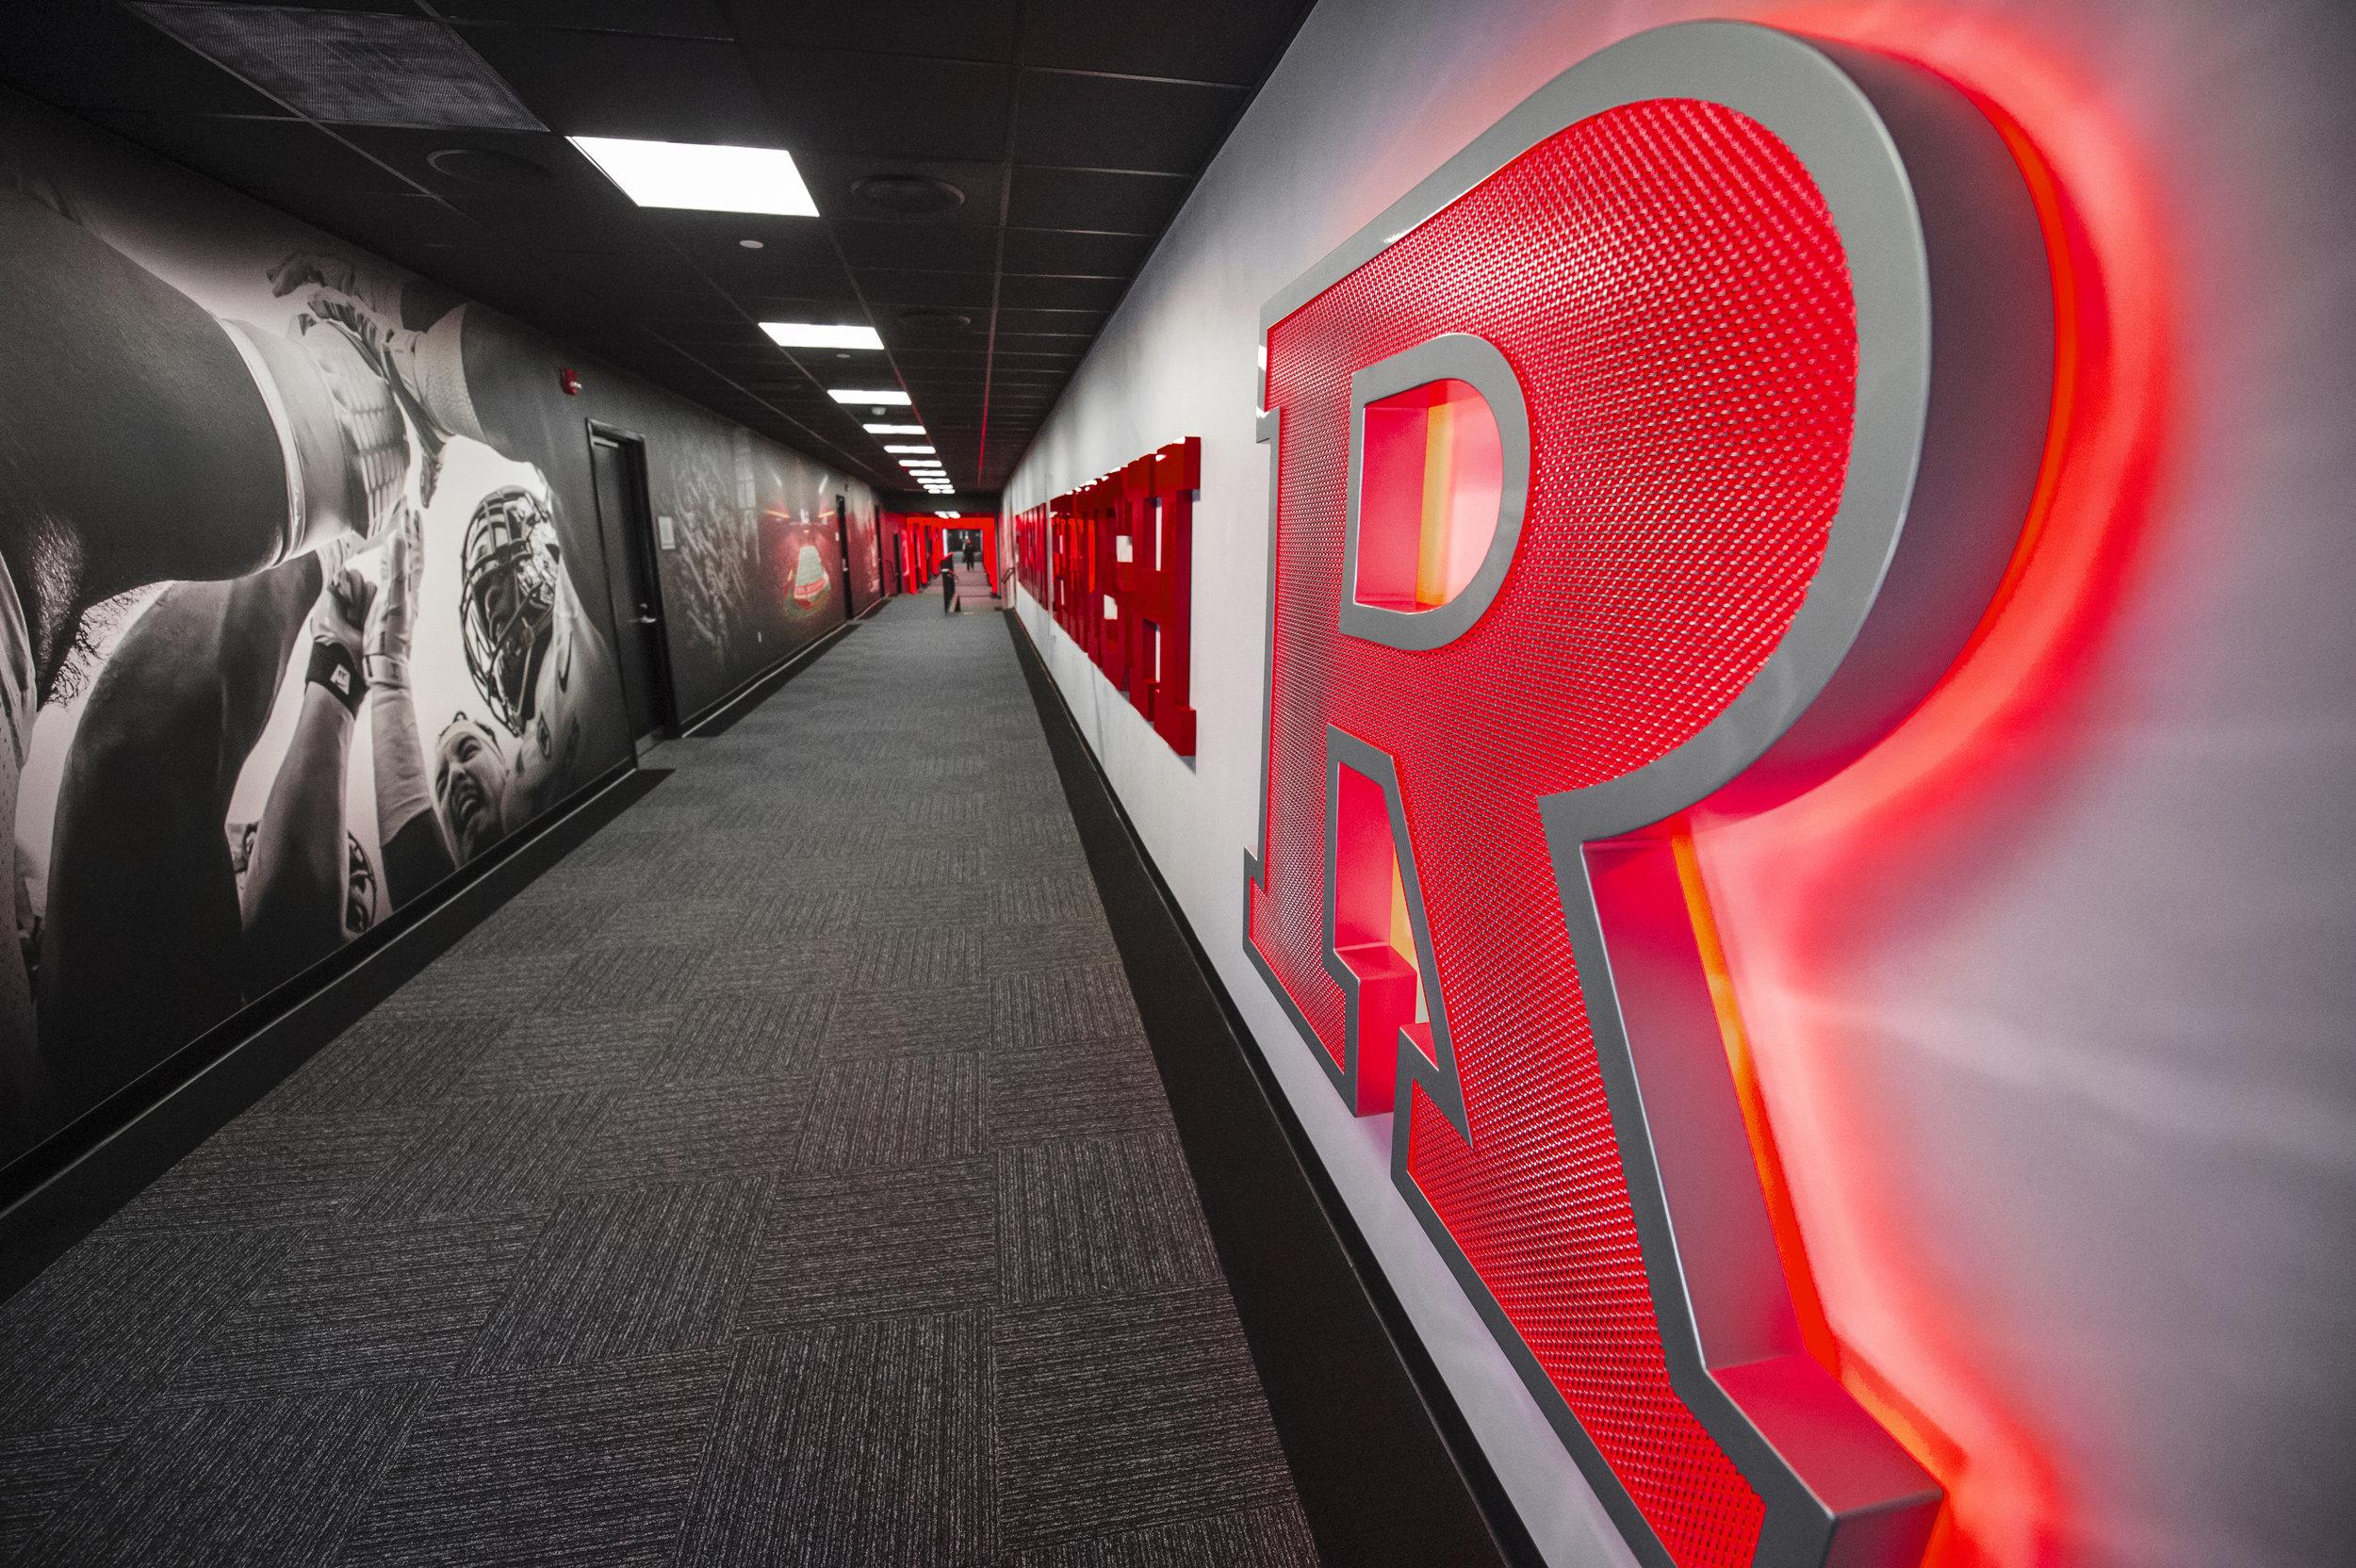 Hallway_R and Graphics.jpg